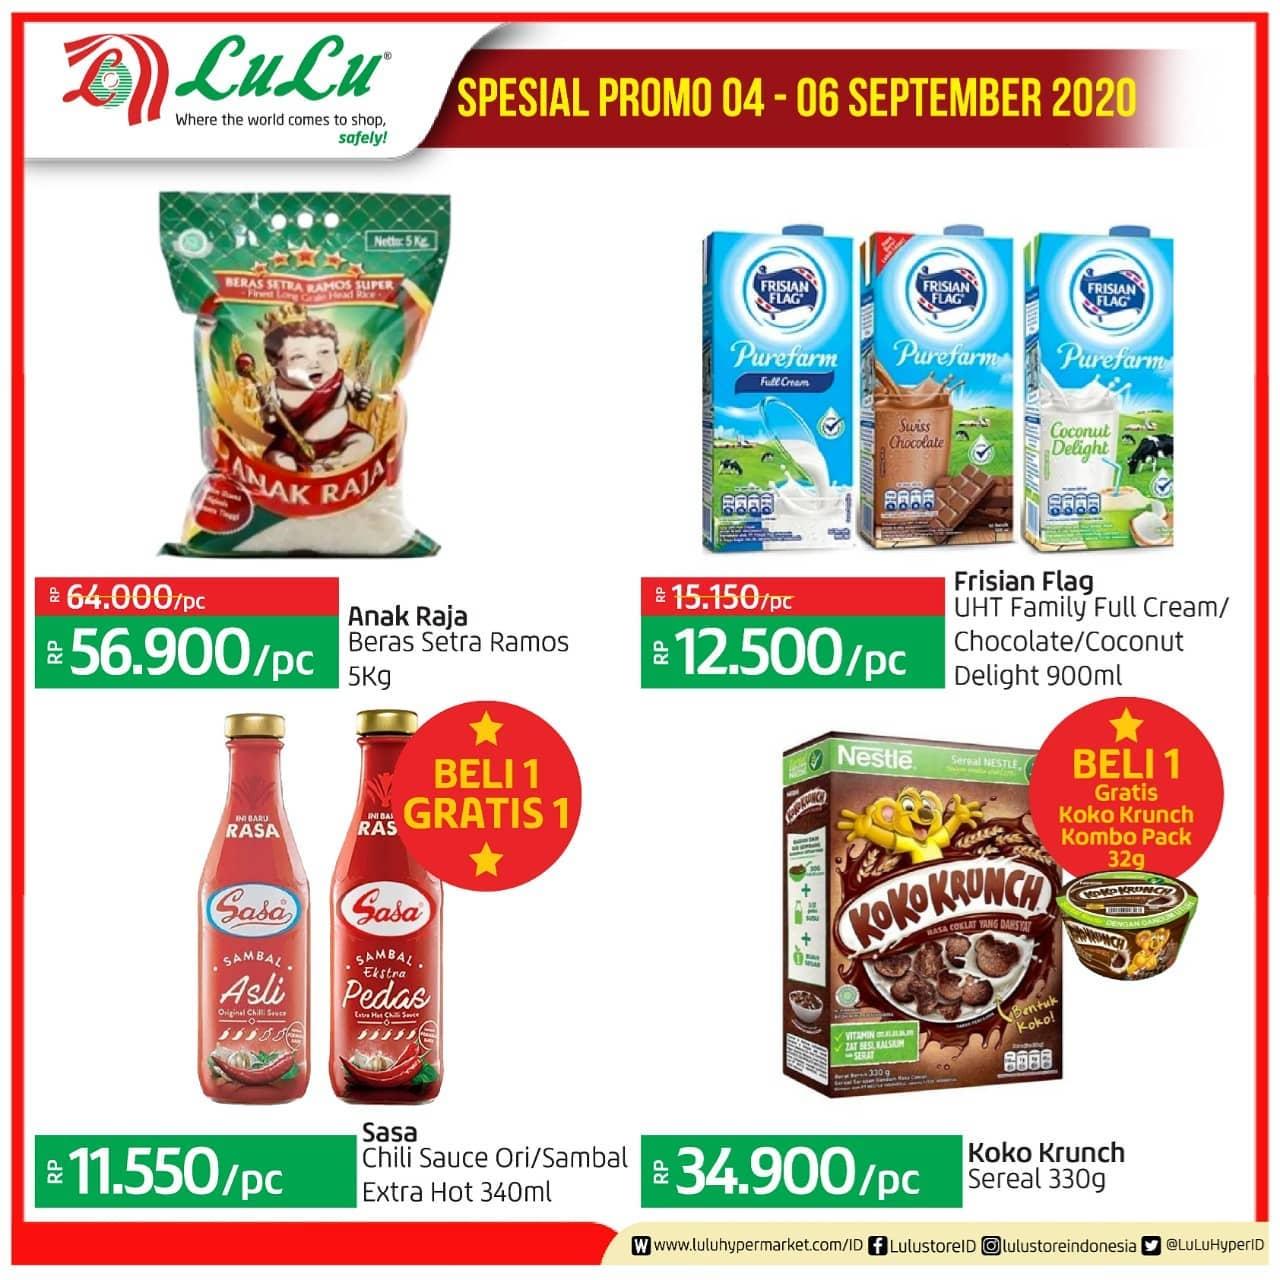 Katalog Promo Lulu Jsm Weekend 4 - 6 September 2020